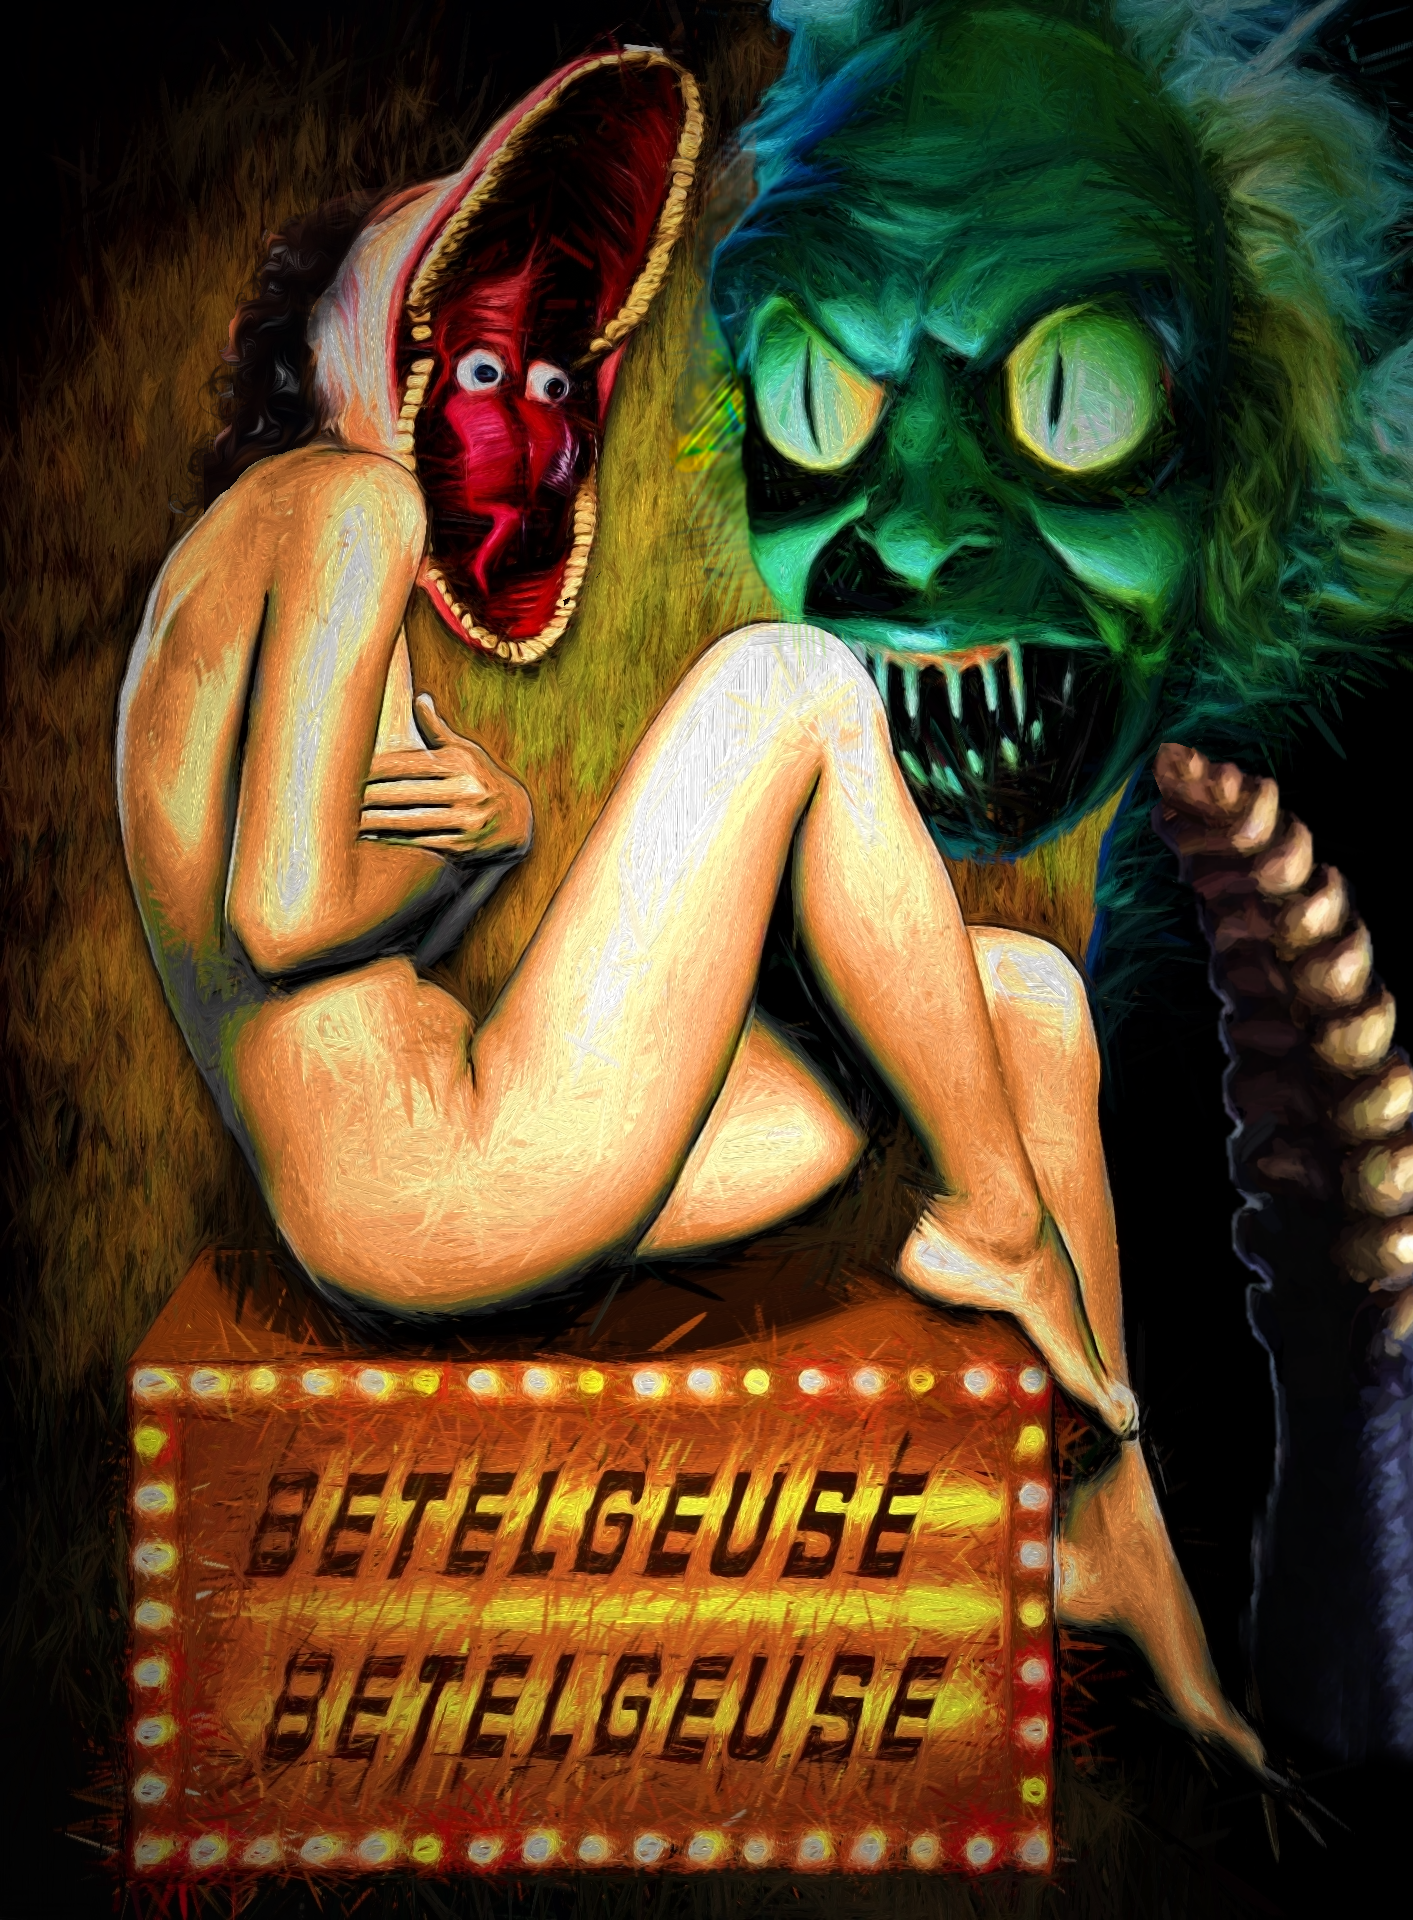 Betelgeuse Betelgeuse Betelgeuse